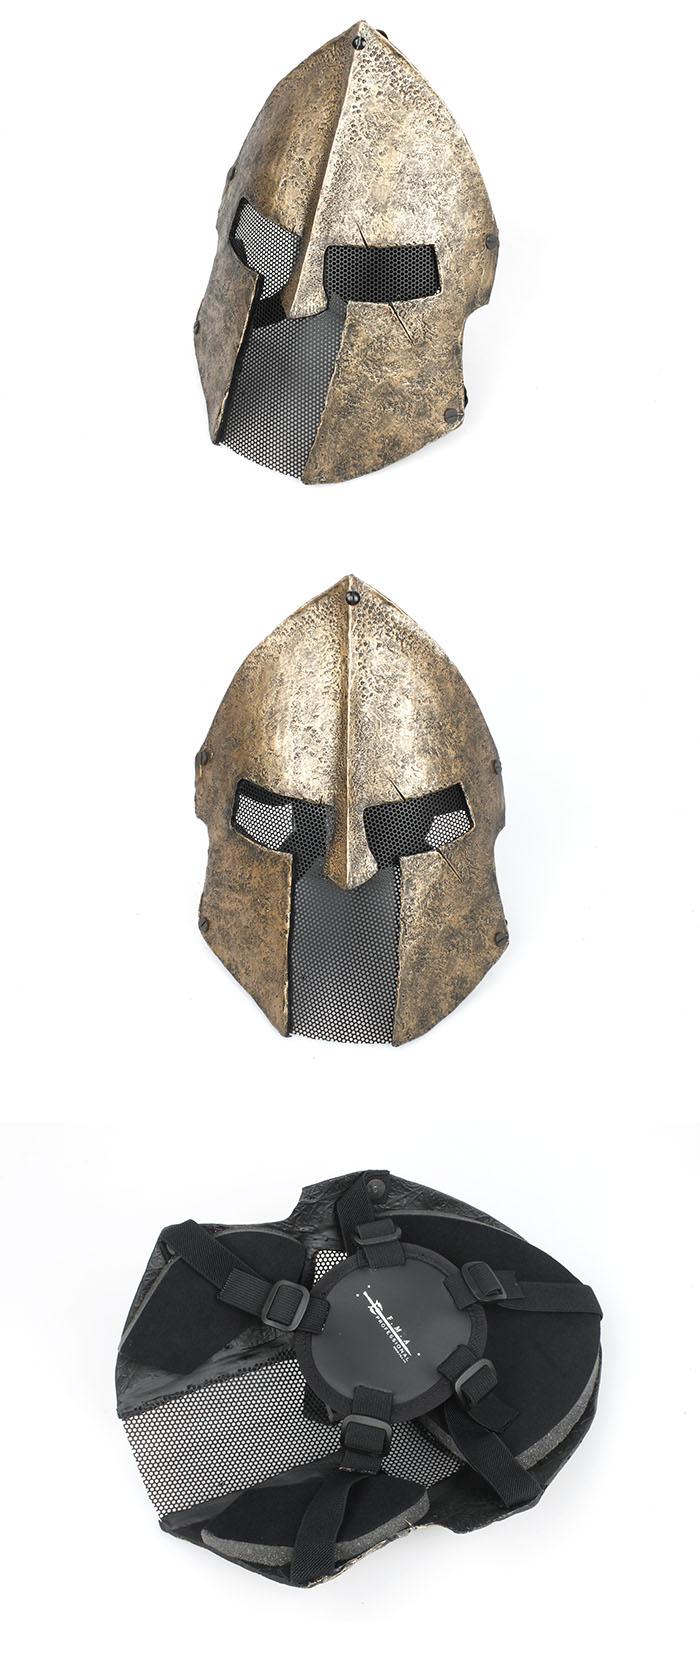 Masques ebairsoft FMA%20Wire%20Mesh%20Mask%20spartan